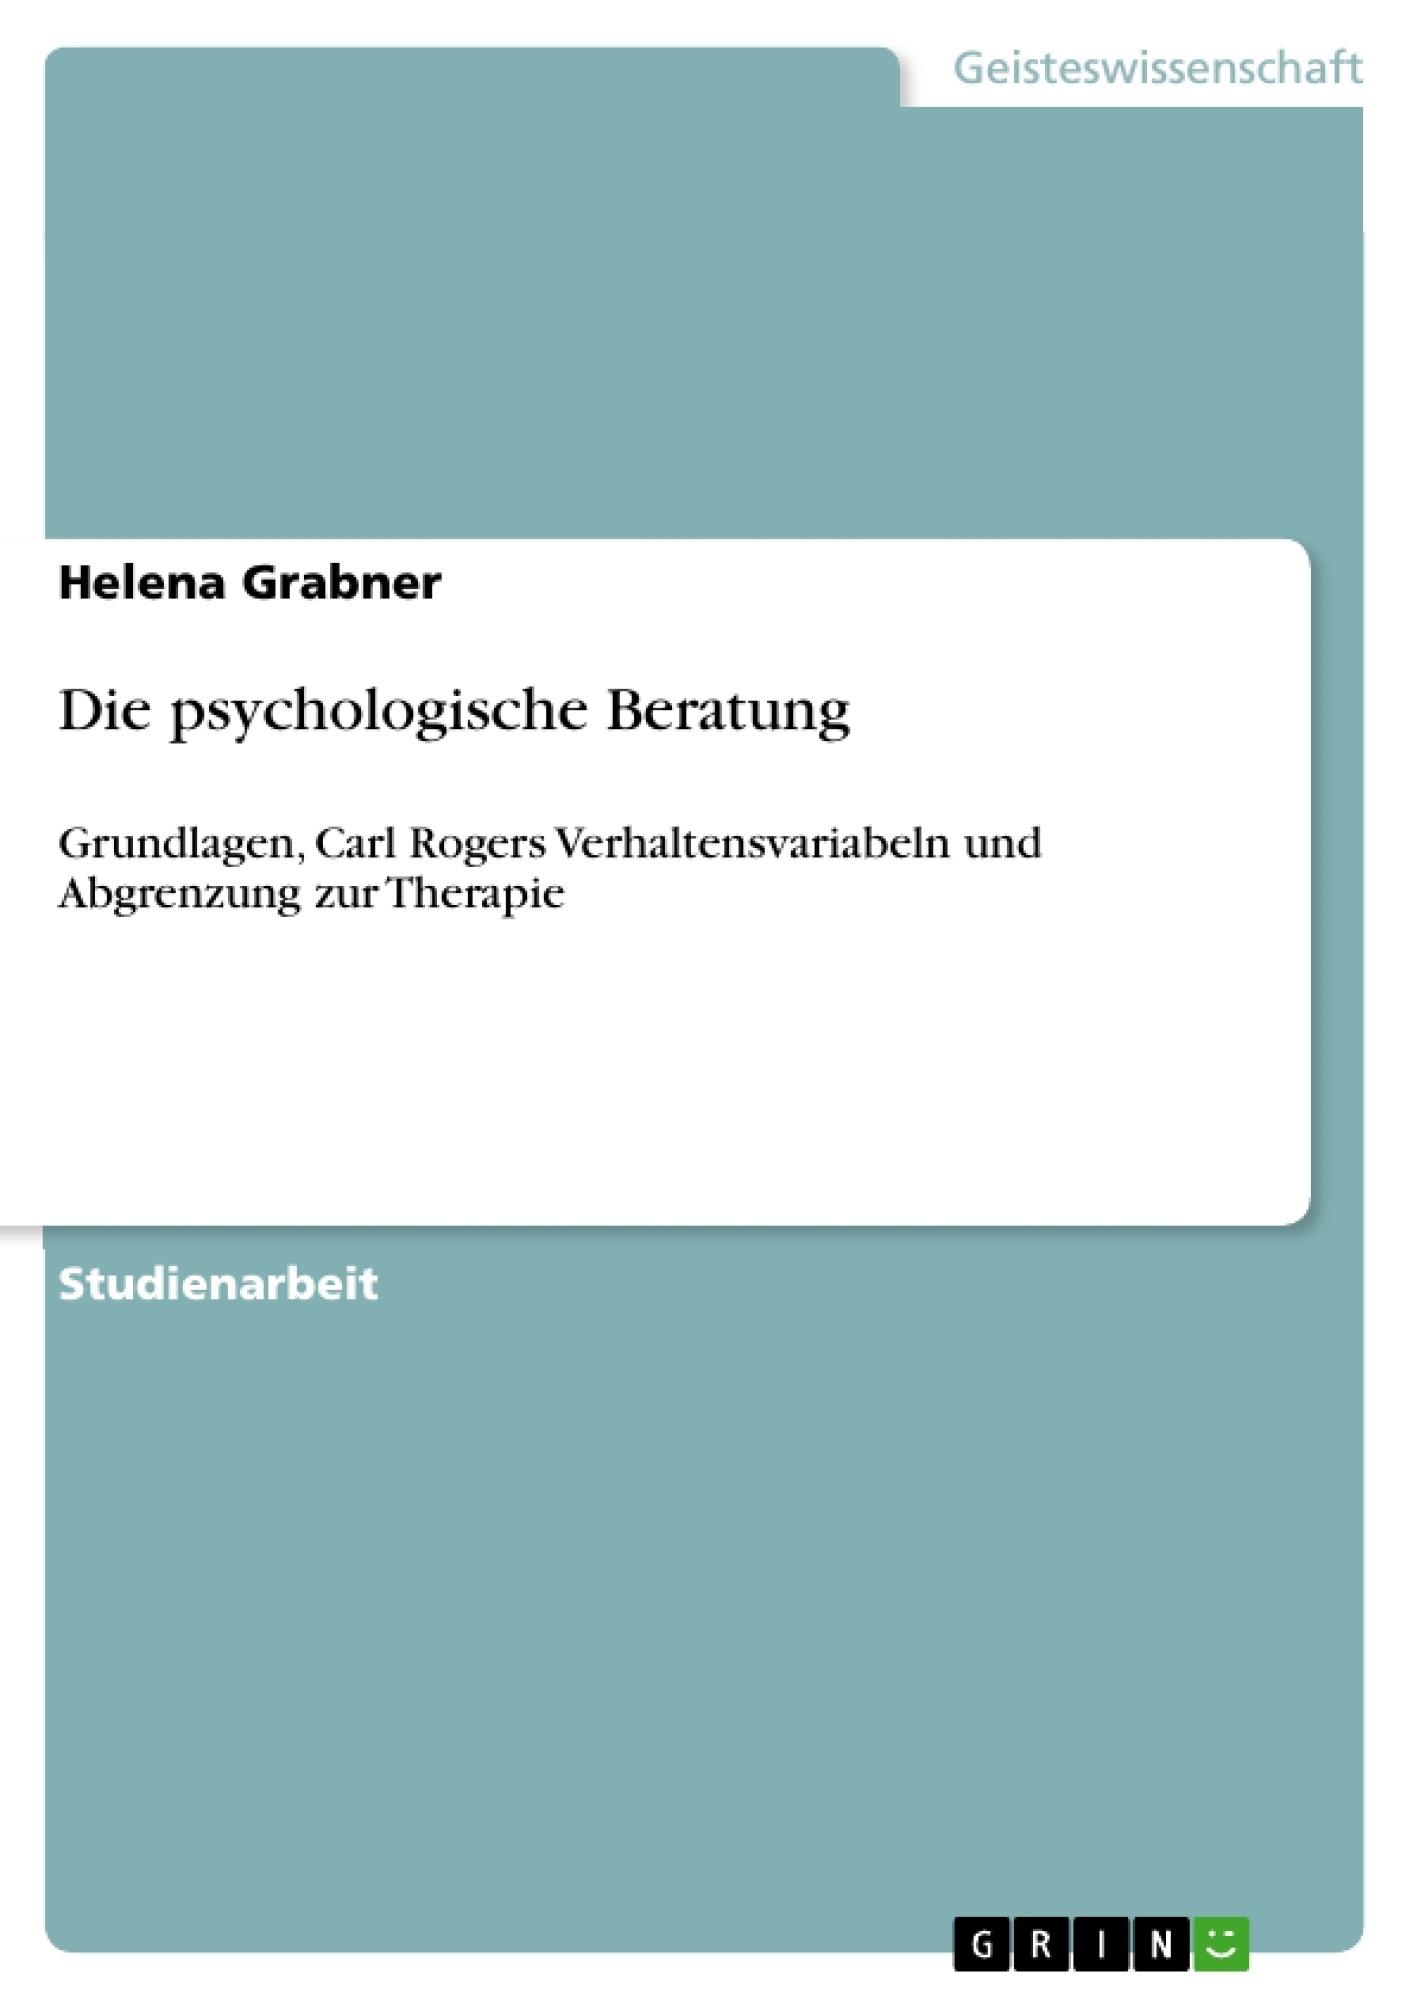 Titel: Die psychologische Beratung